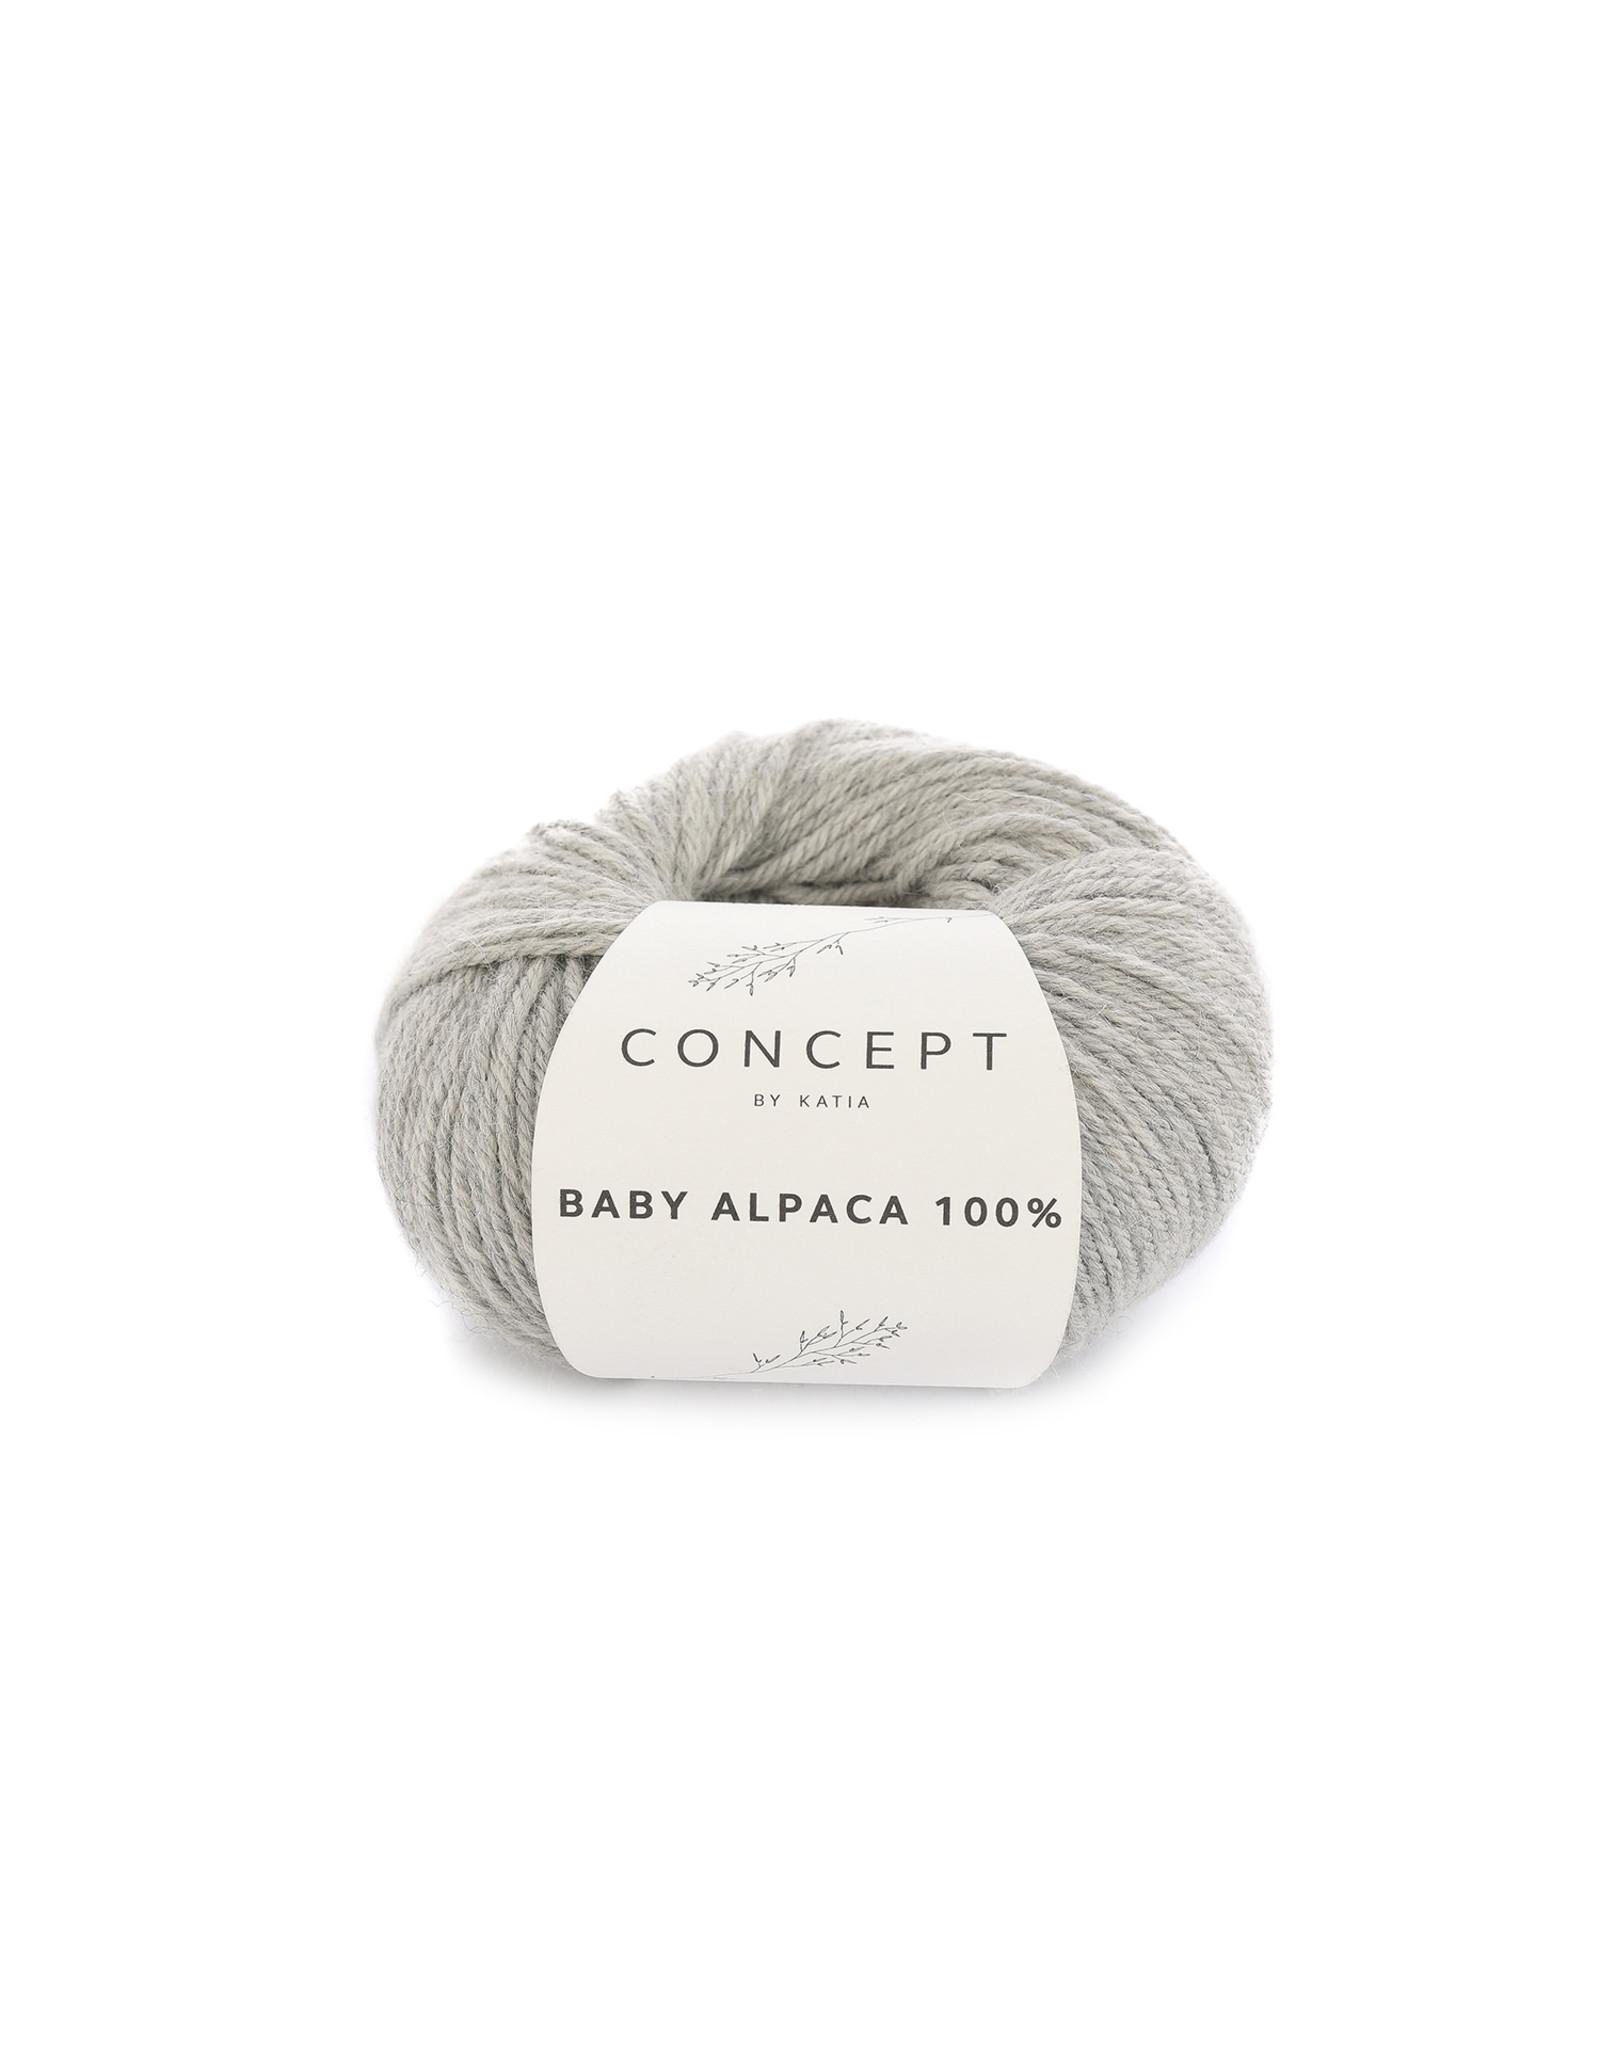 Katia Baby Alpaca 100% - kleur 503 - Licht grijs - 50 gr. = 125 m. - 100% Baby Alpaca